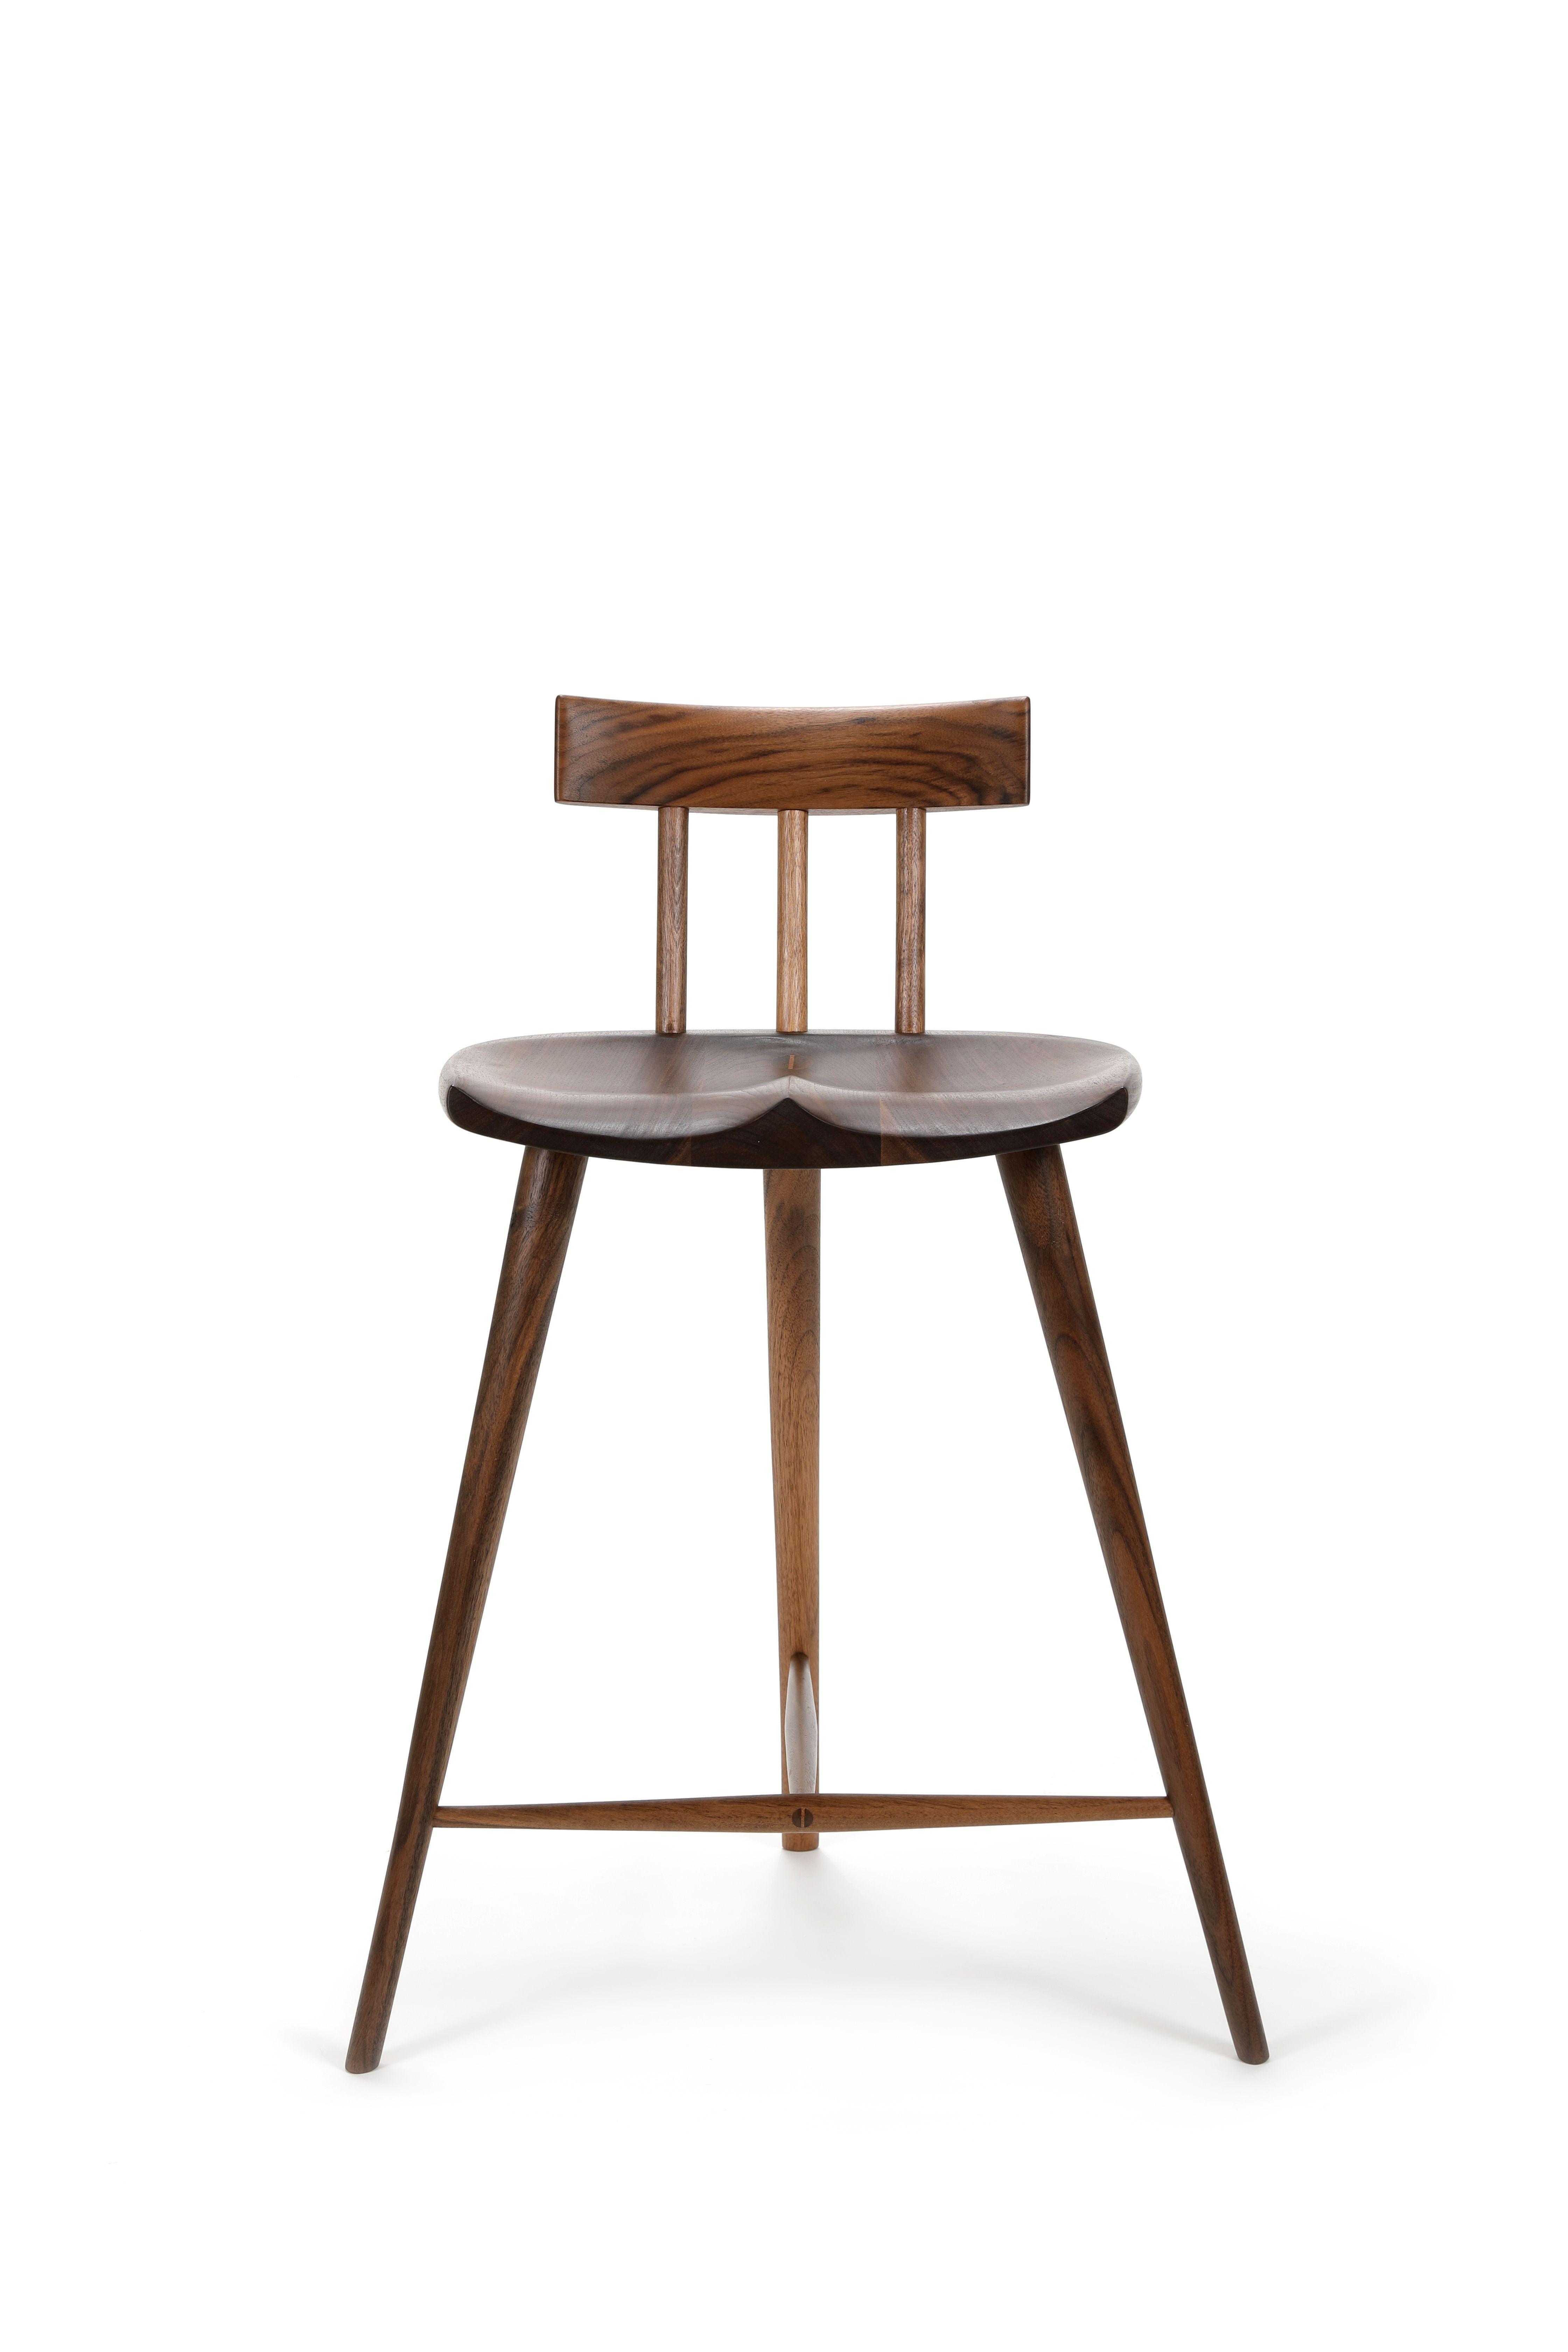 Walnut Three Legged Stool Toroamigo Stool Leather Dining Room Chairs Leather Chair